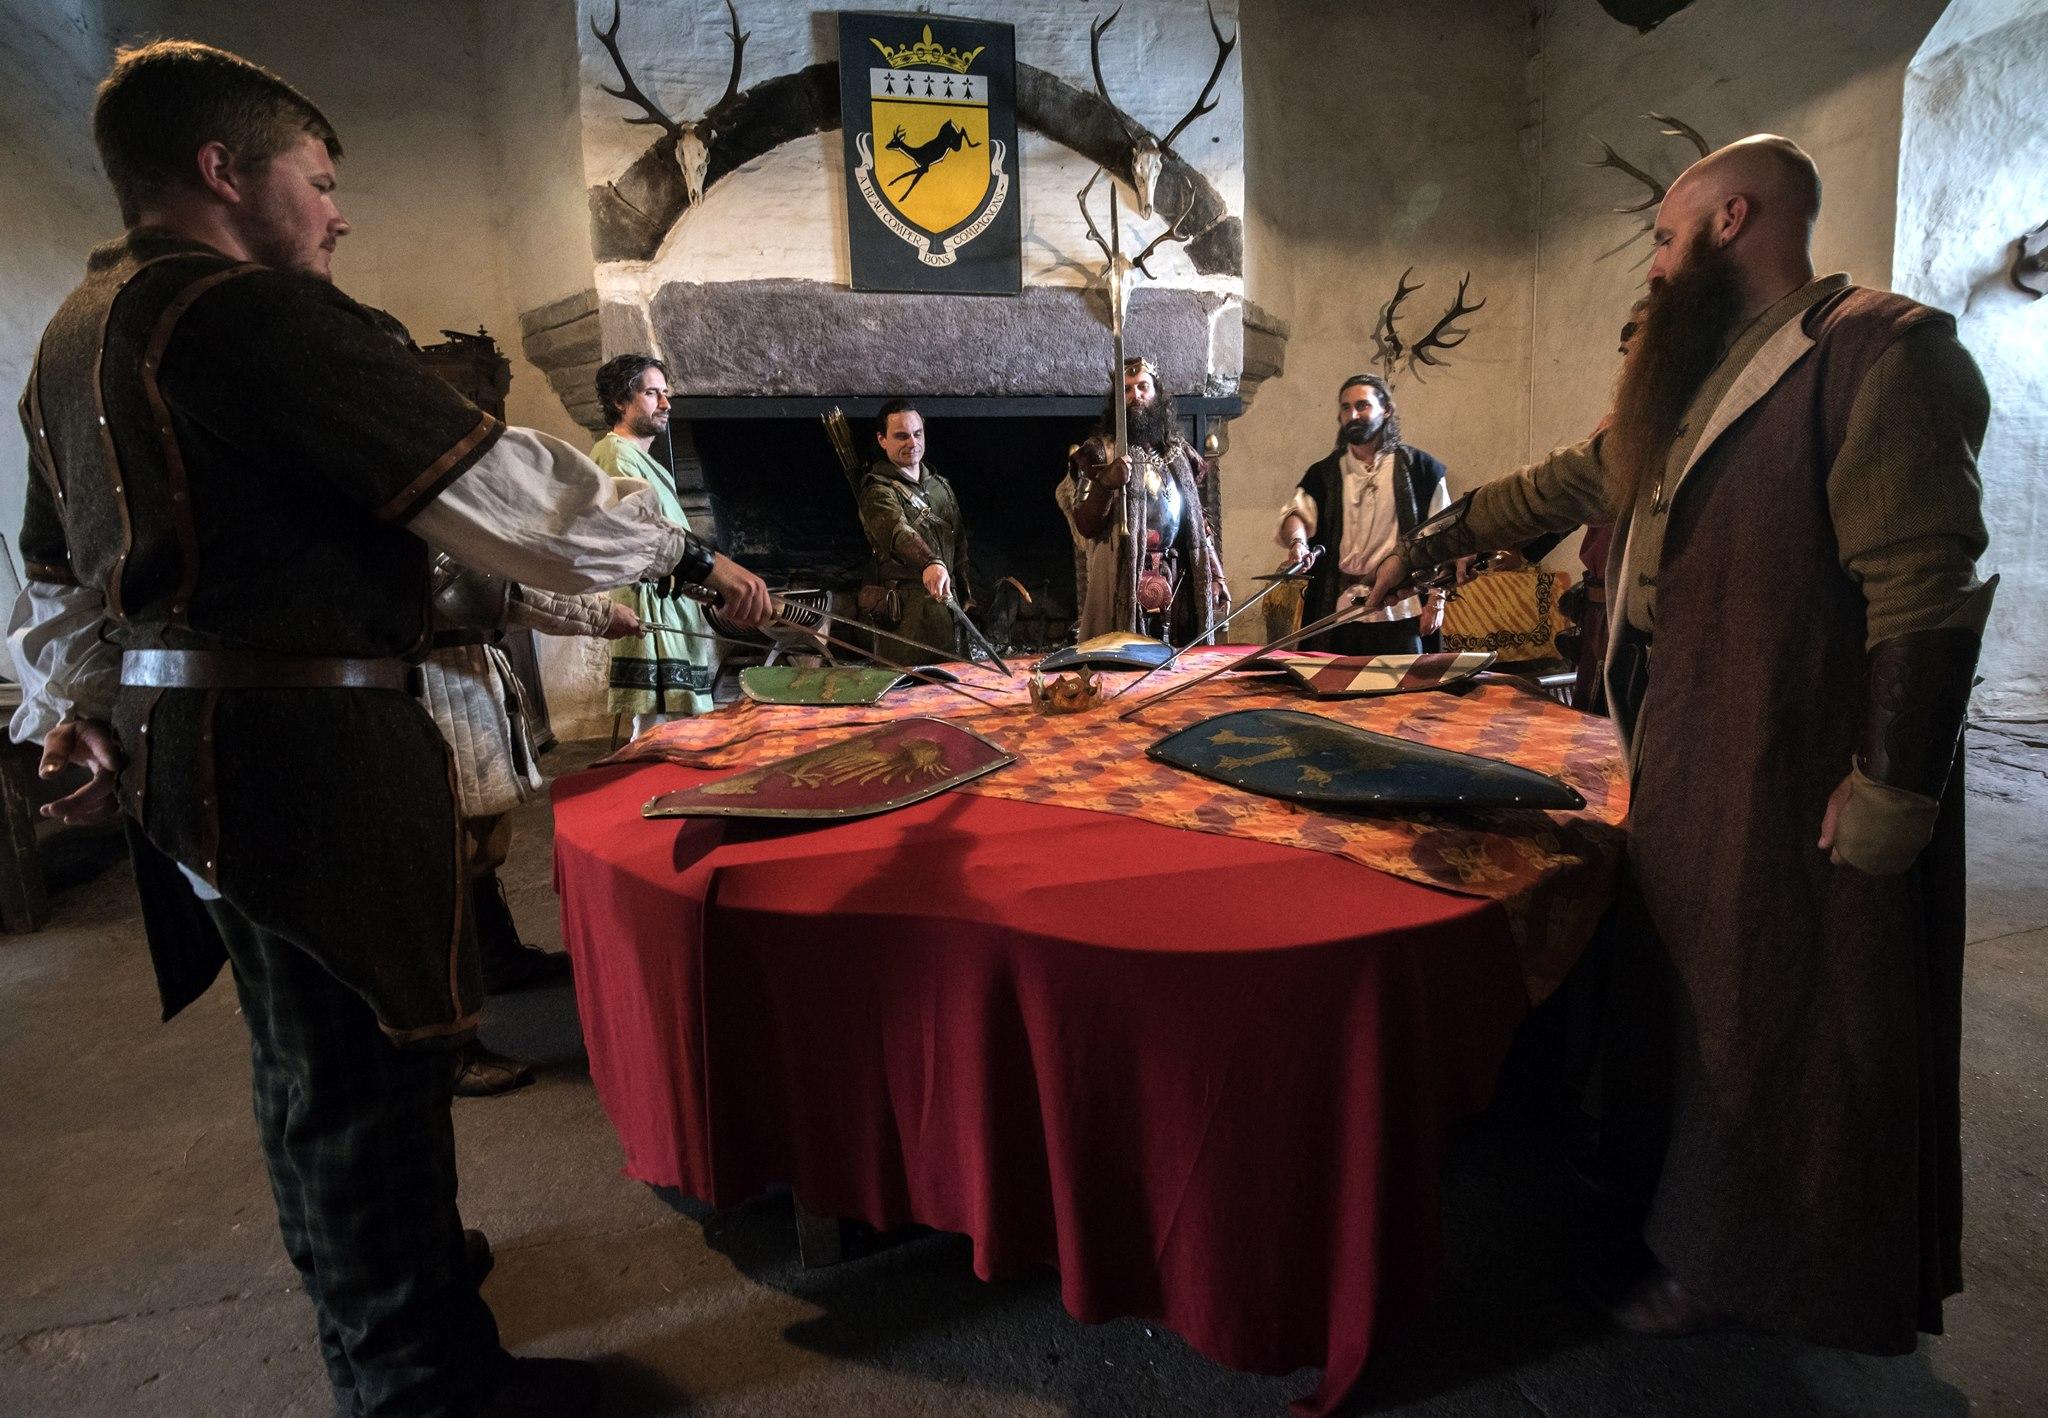 Devenir chevalier broc liande - Blason chevalier table ronde ...